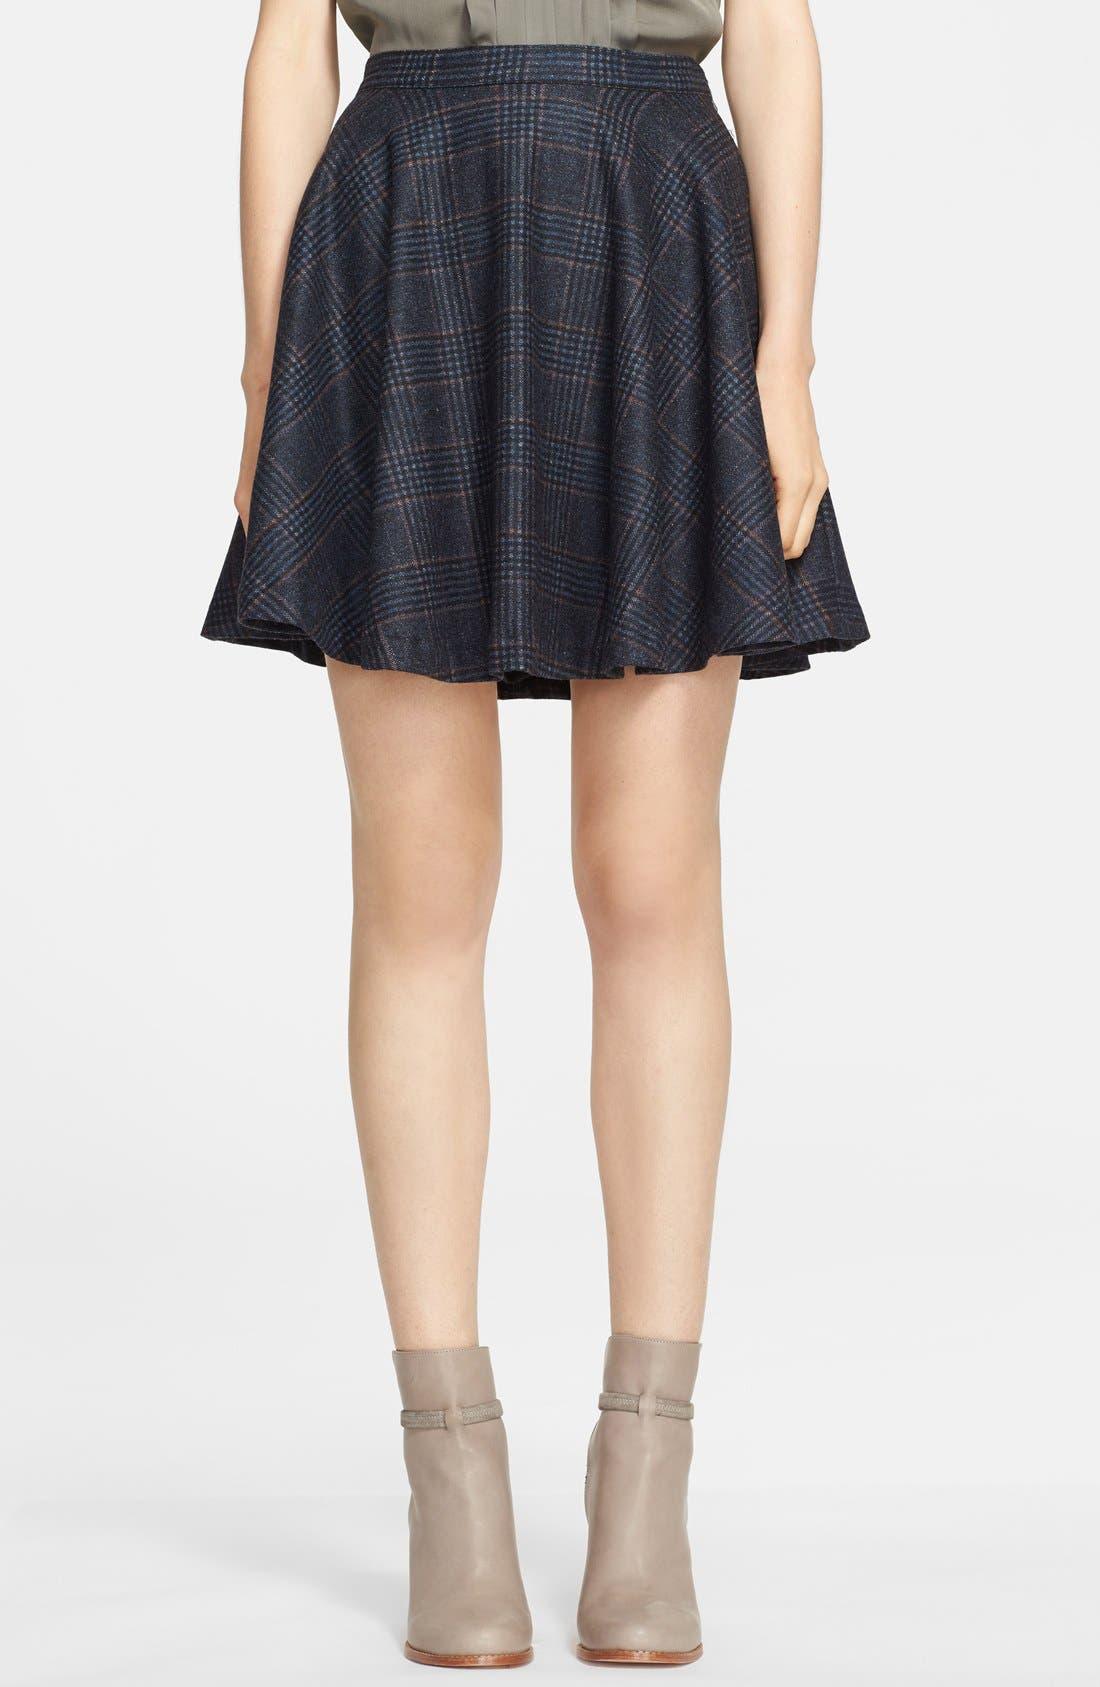 Alternate Image 1 Selected - Joie 'Ivanna' Plaid Flare Skirt